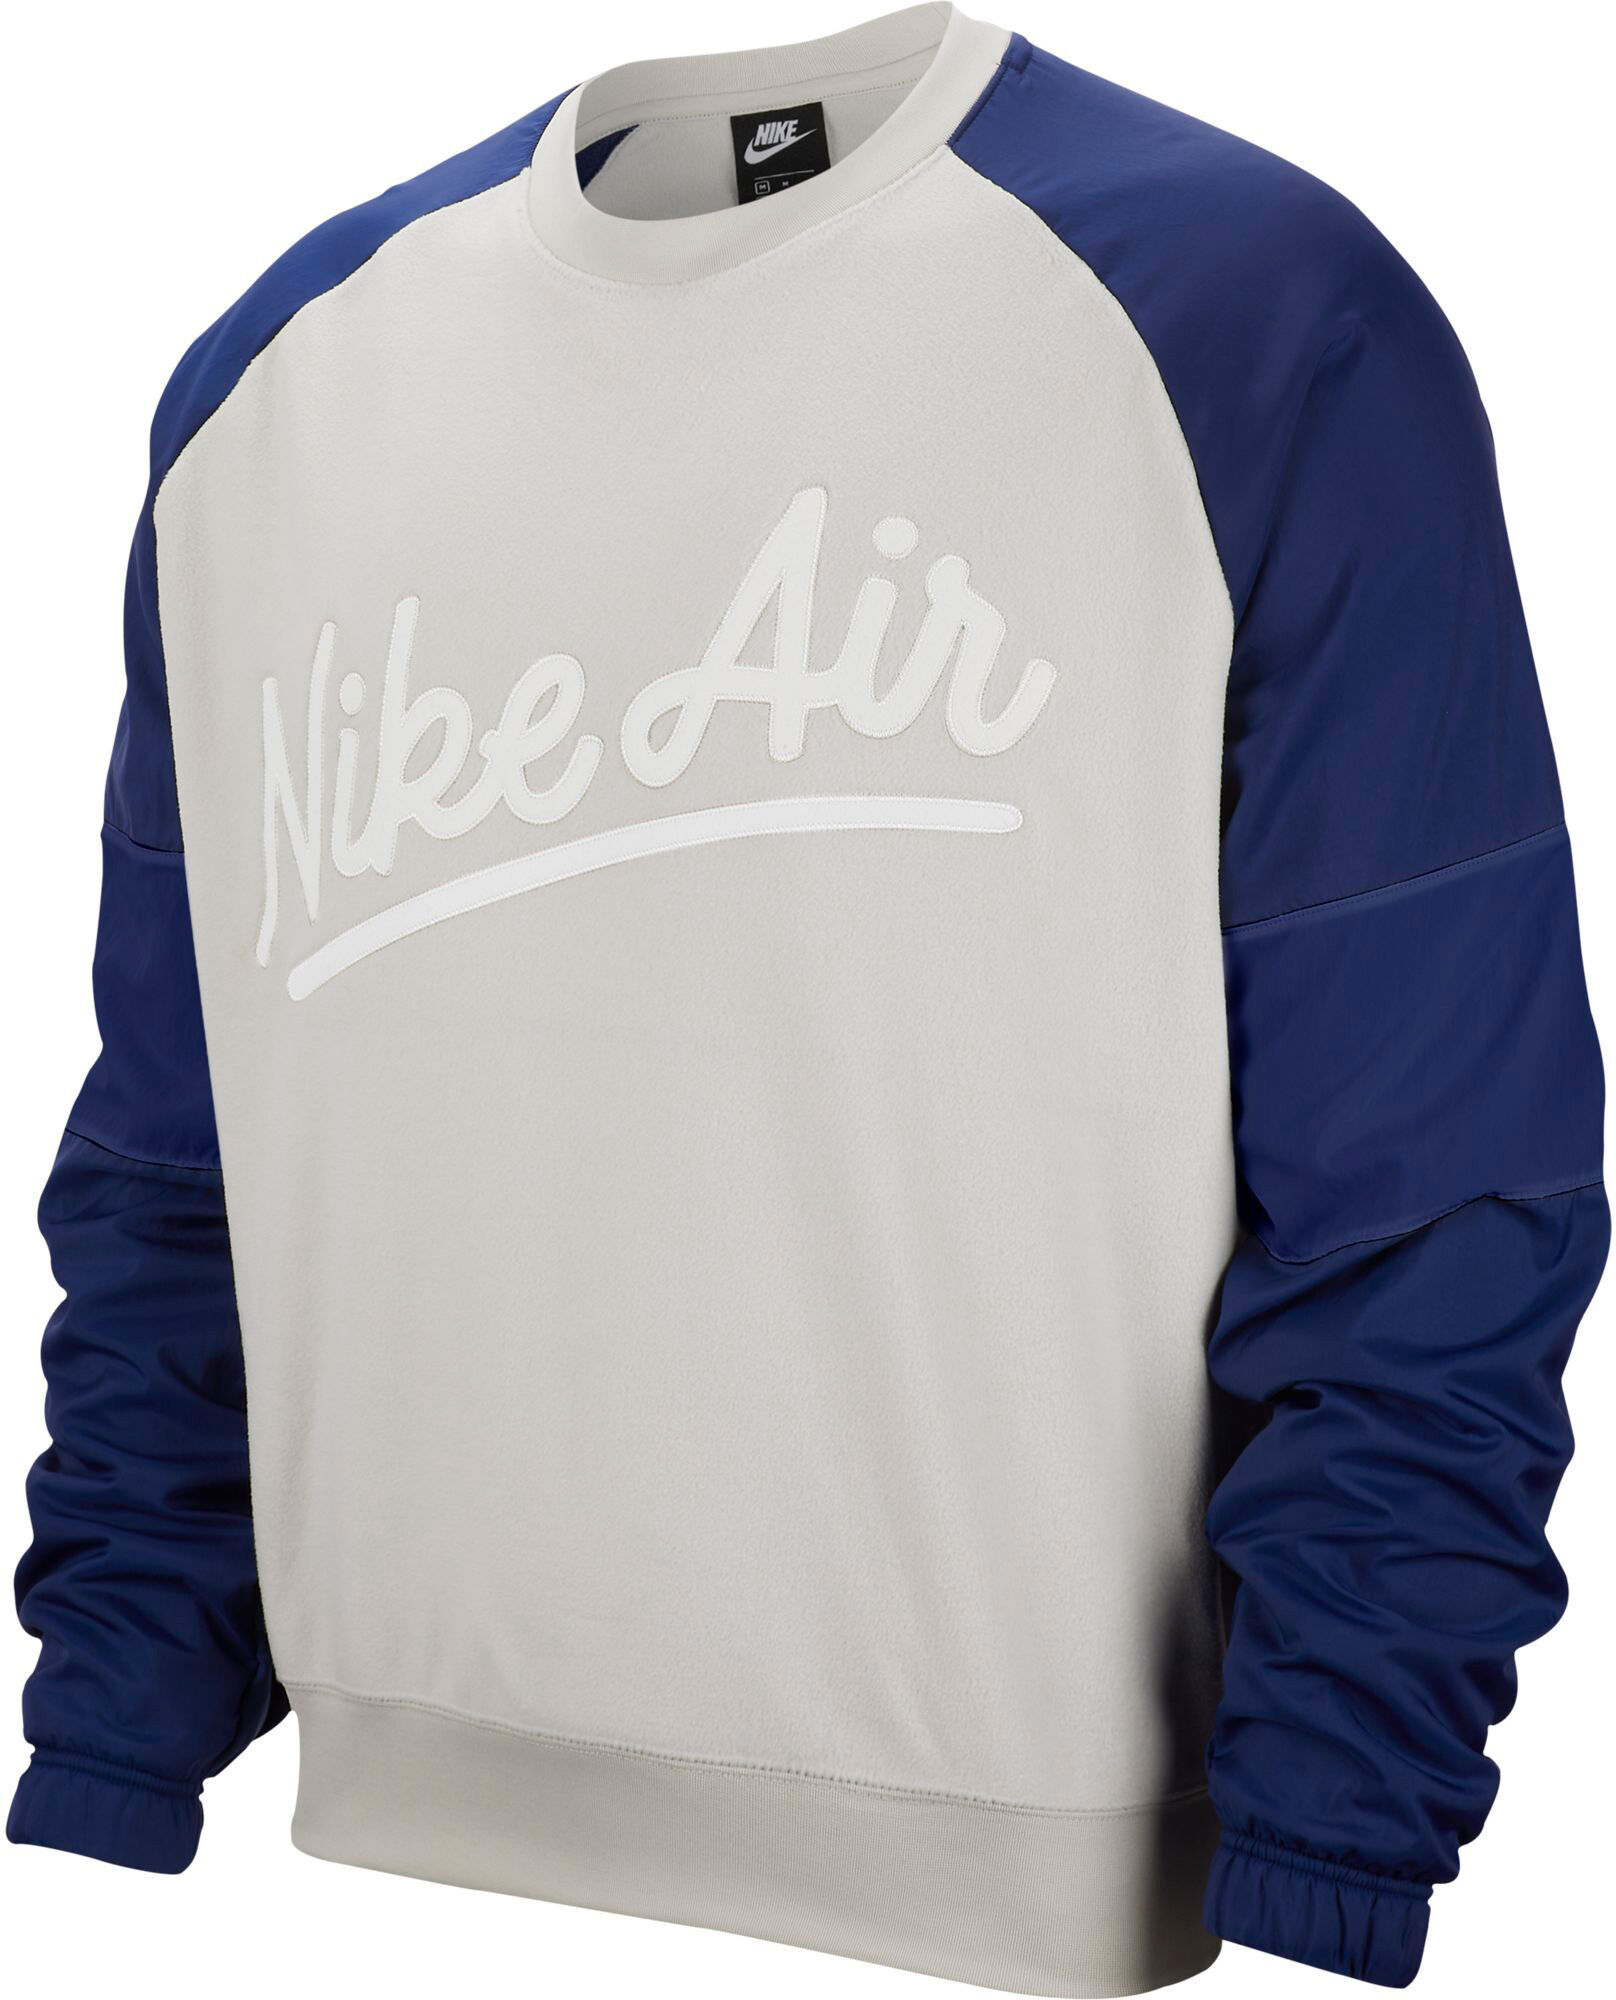 NIKE SPORTSWEAR Air Crew Sweatshirt für Herren Grau